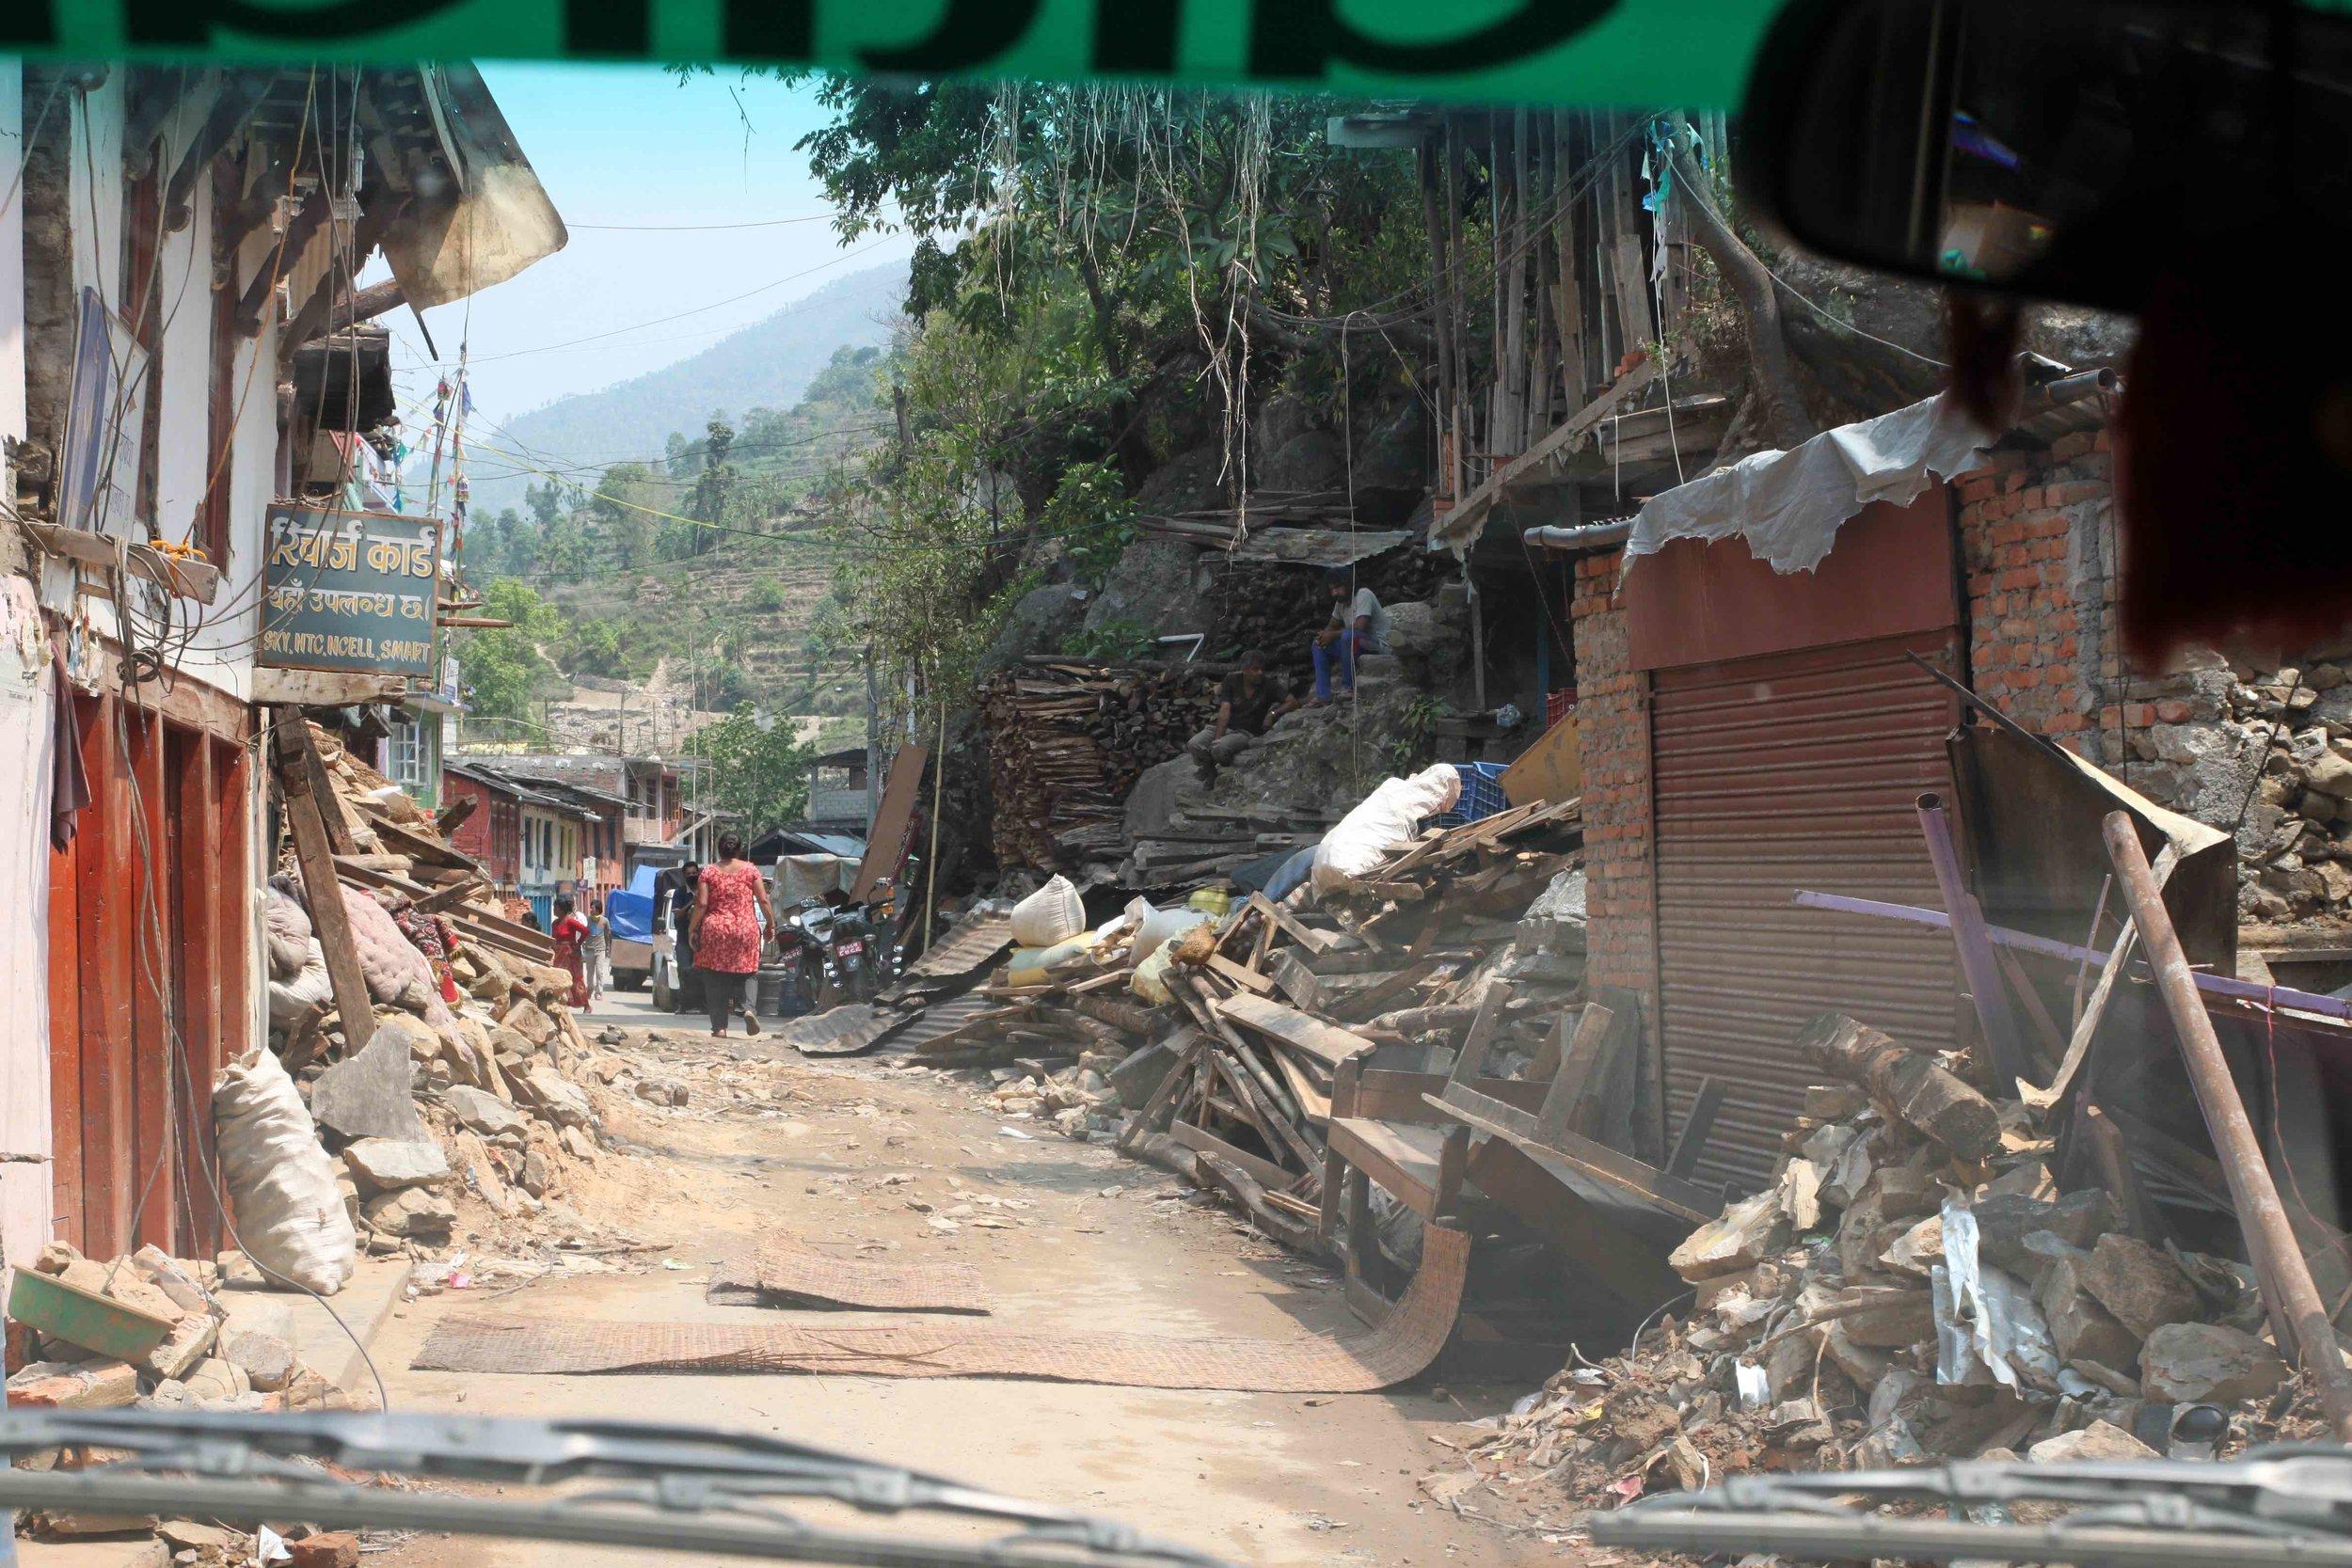 4b.-Wreckage-in-the-road.jpg